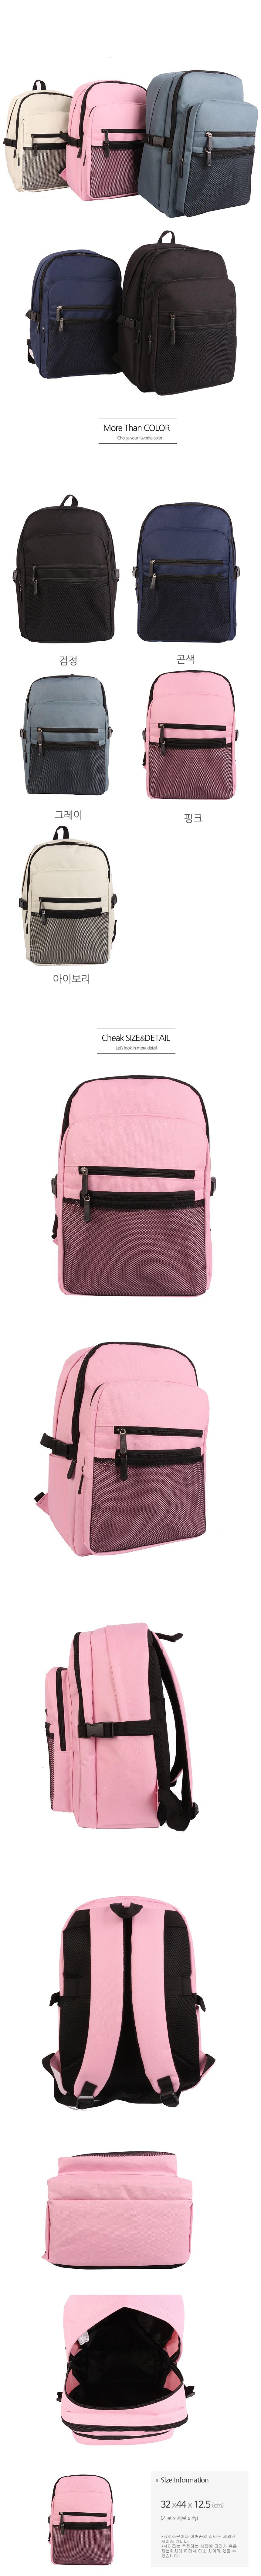 BS plain mesh backpack 5color